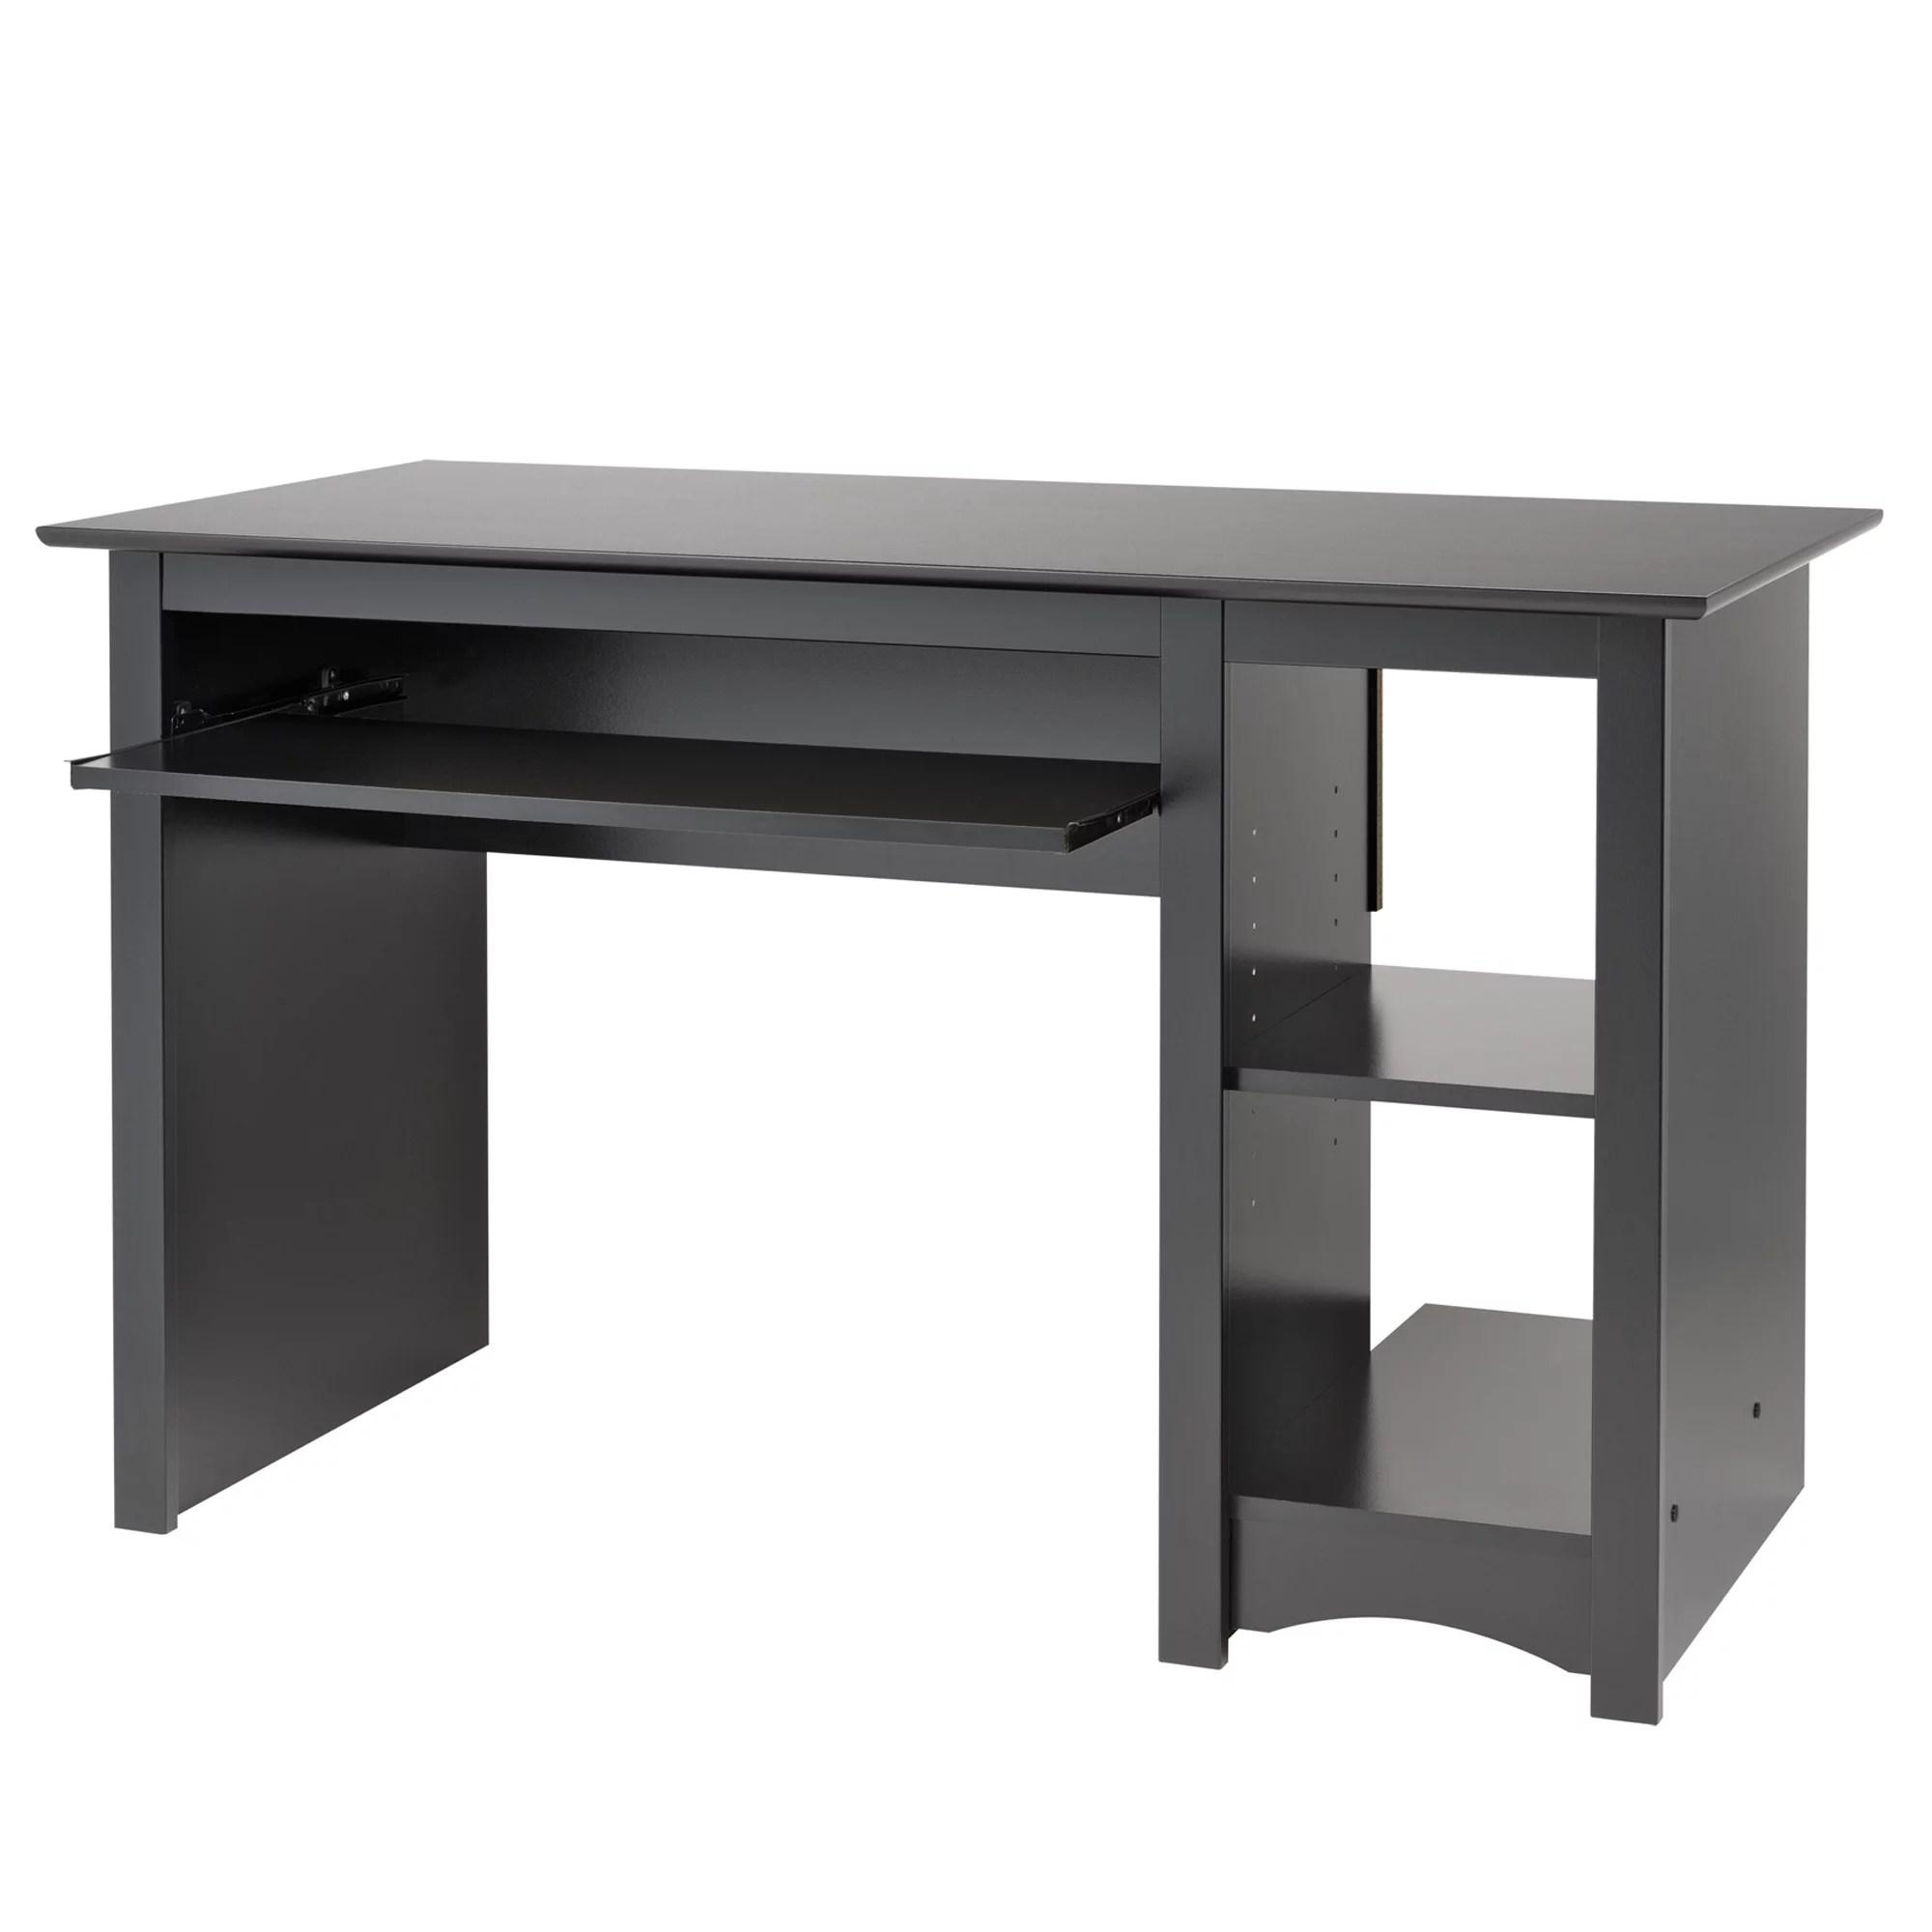 prepac home office computer desk black walmart com walmart com